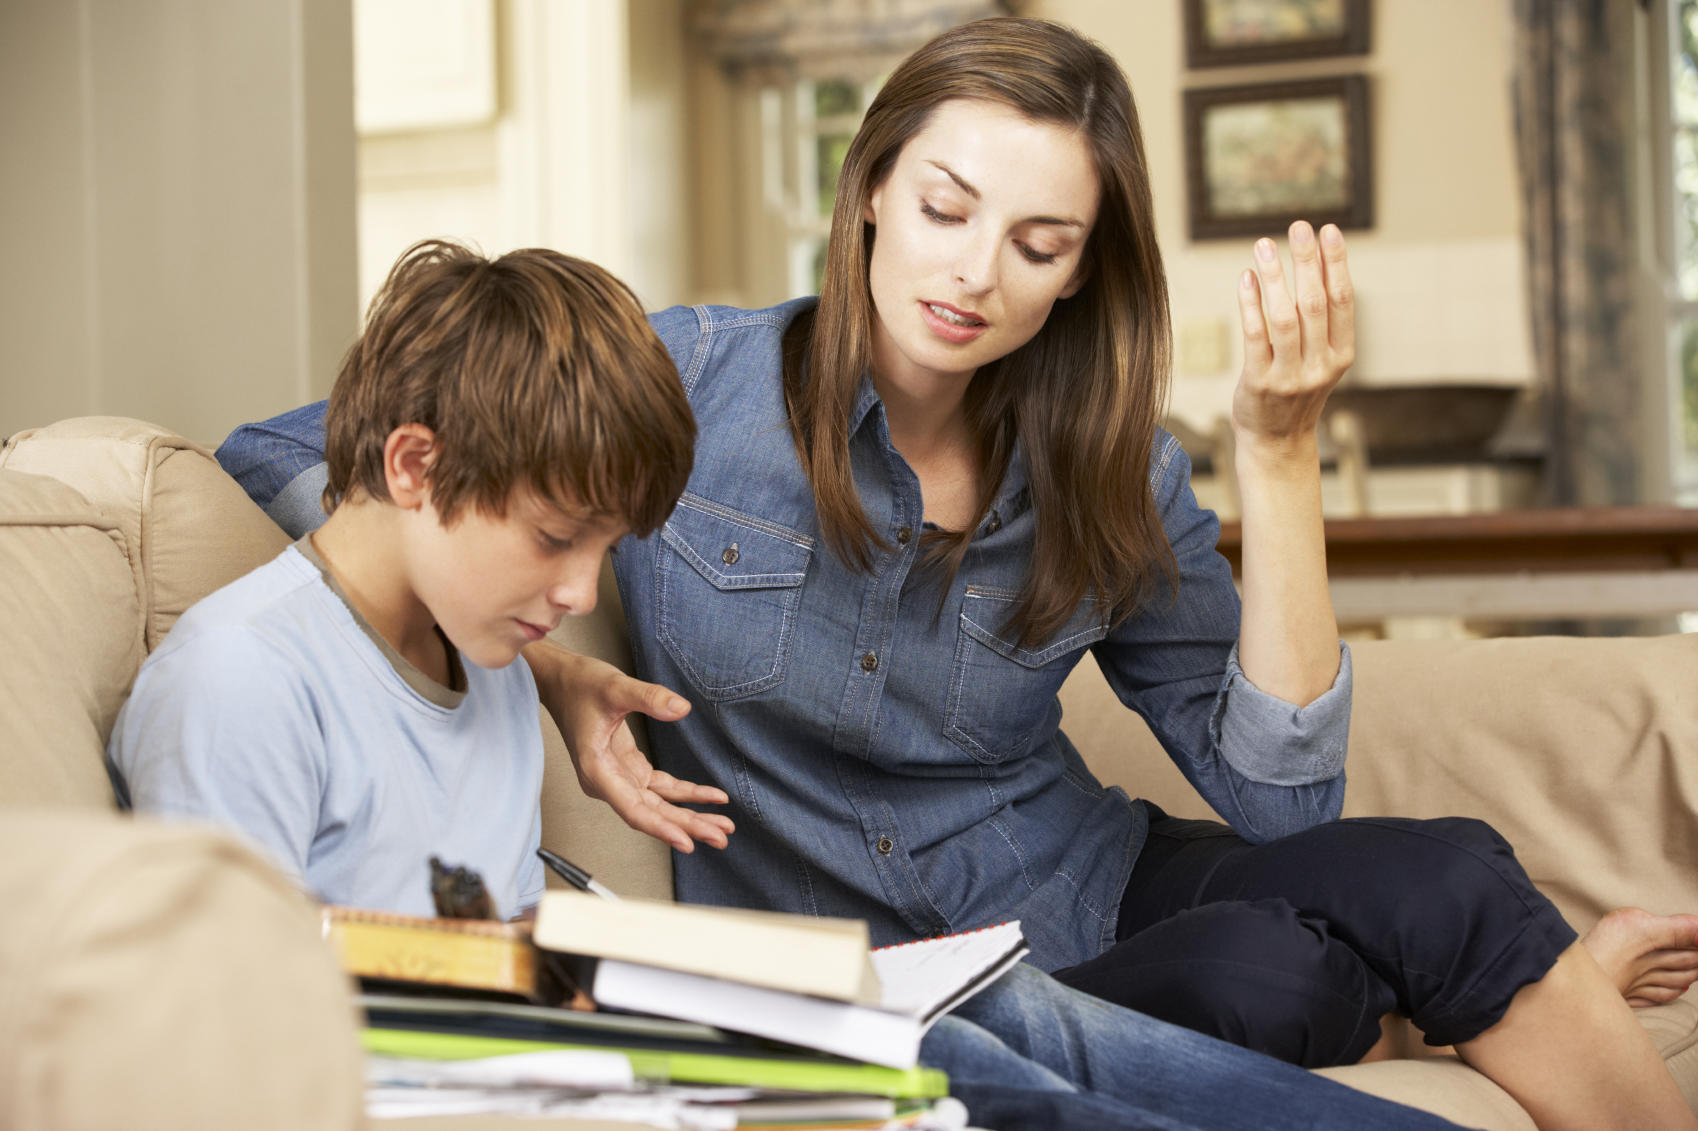 woman with kid doing homework